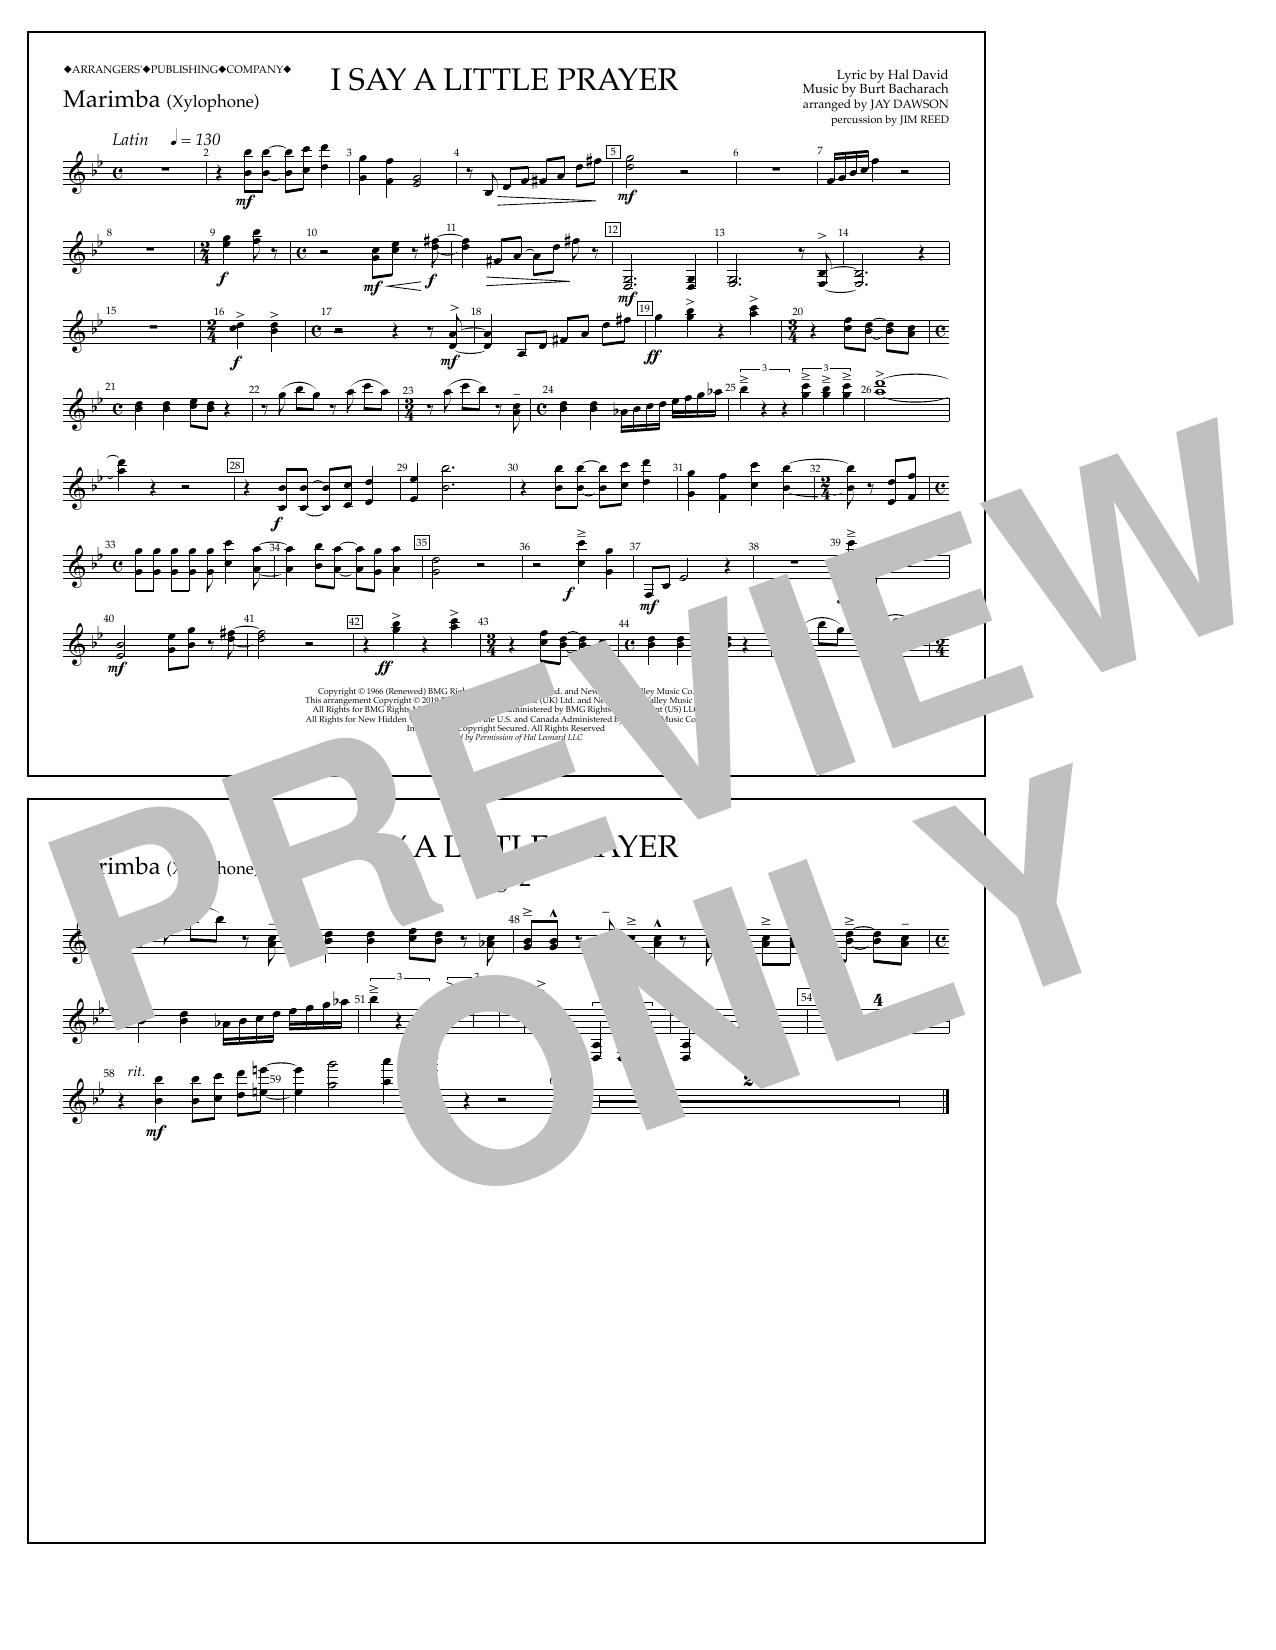 Aretha Franklin I Say a Little Prayer (arr. Jay Dawson) - Marimba sheet music notes and chords